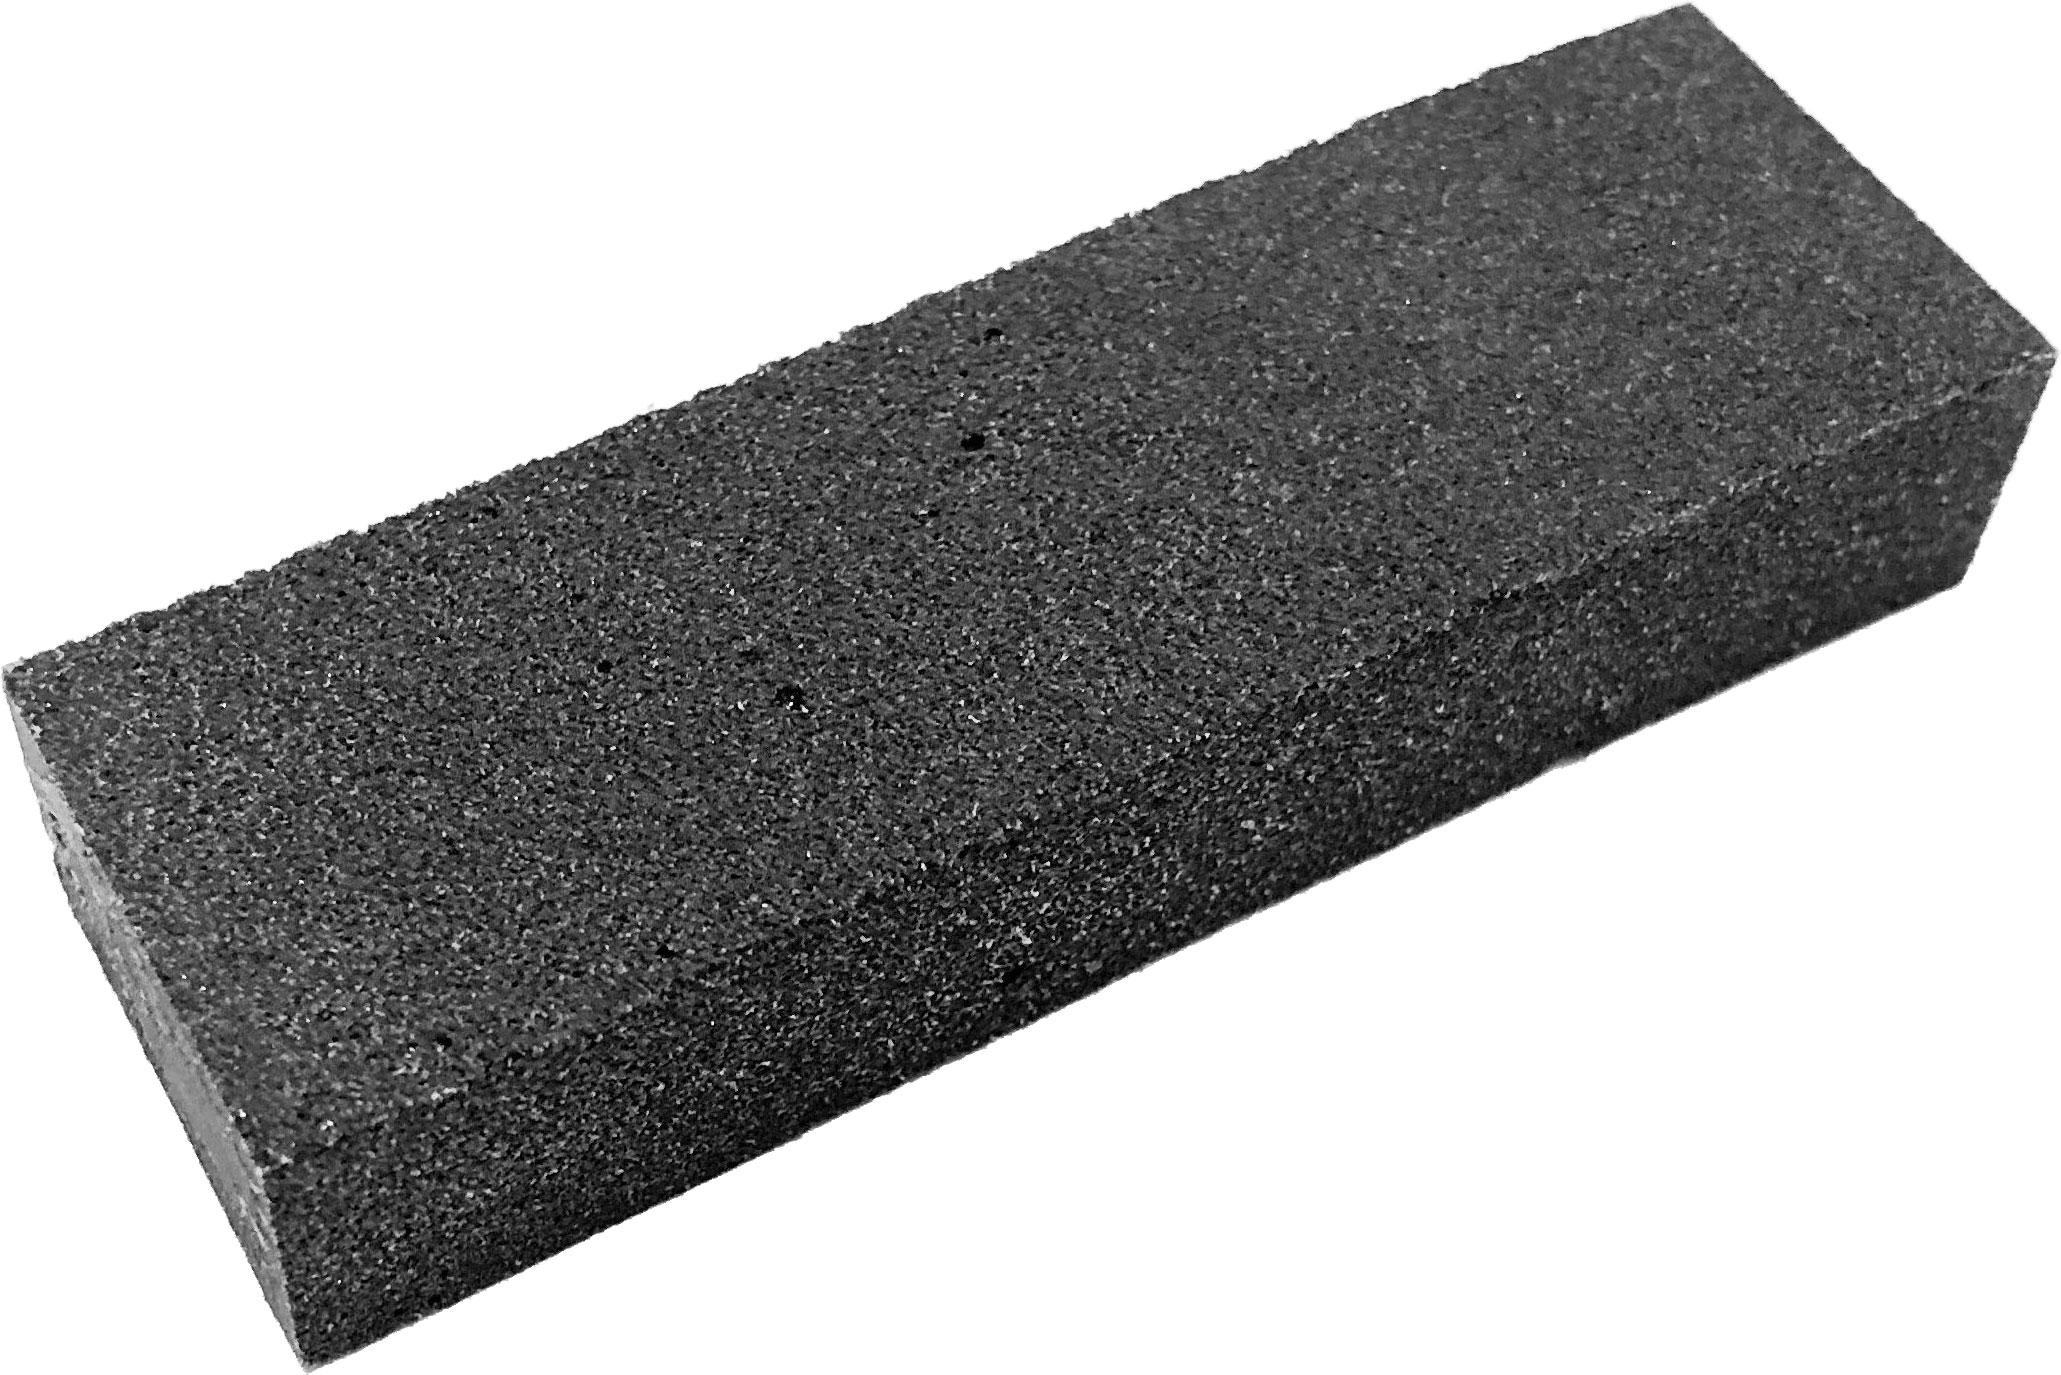 Super Rust and Tarnish Eraser, One Eraser Block